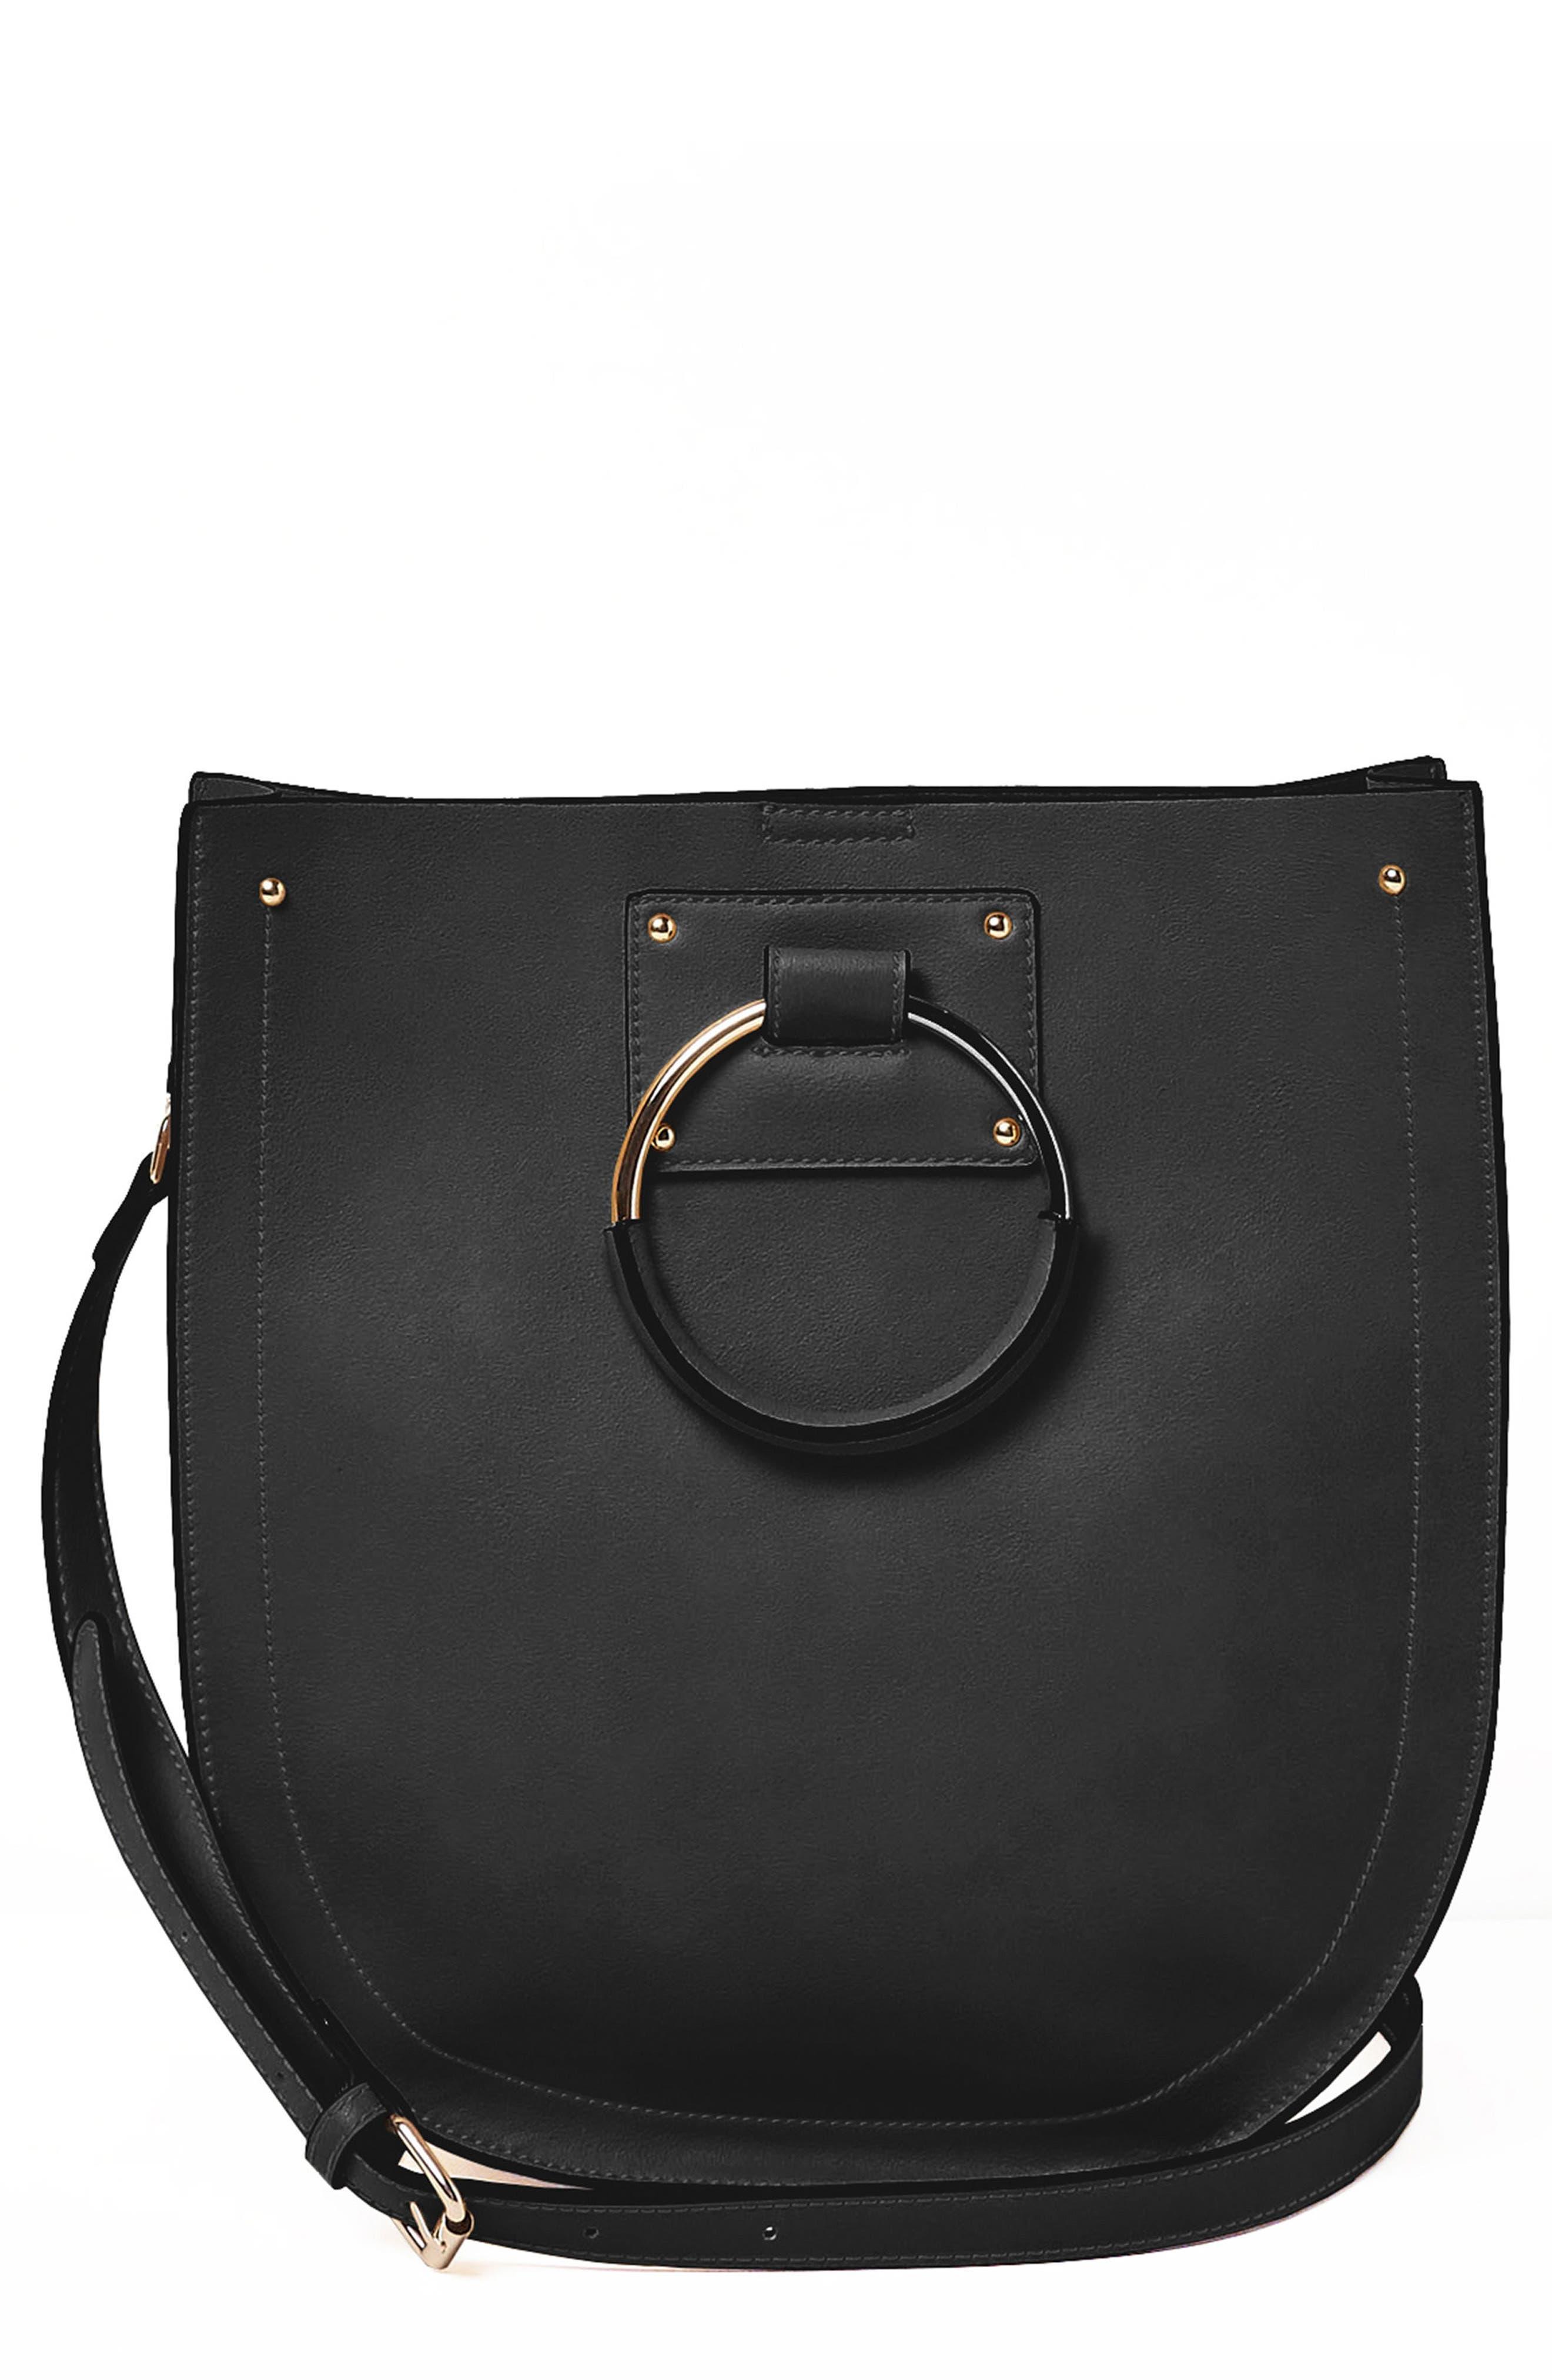 Urban Originals Nordic Dream Vegan Leather Shoulder Bag